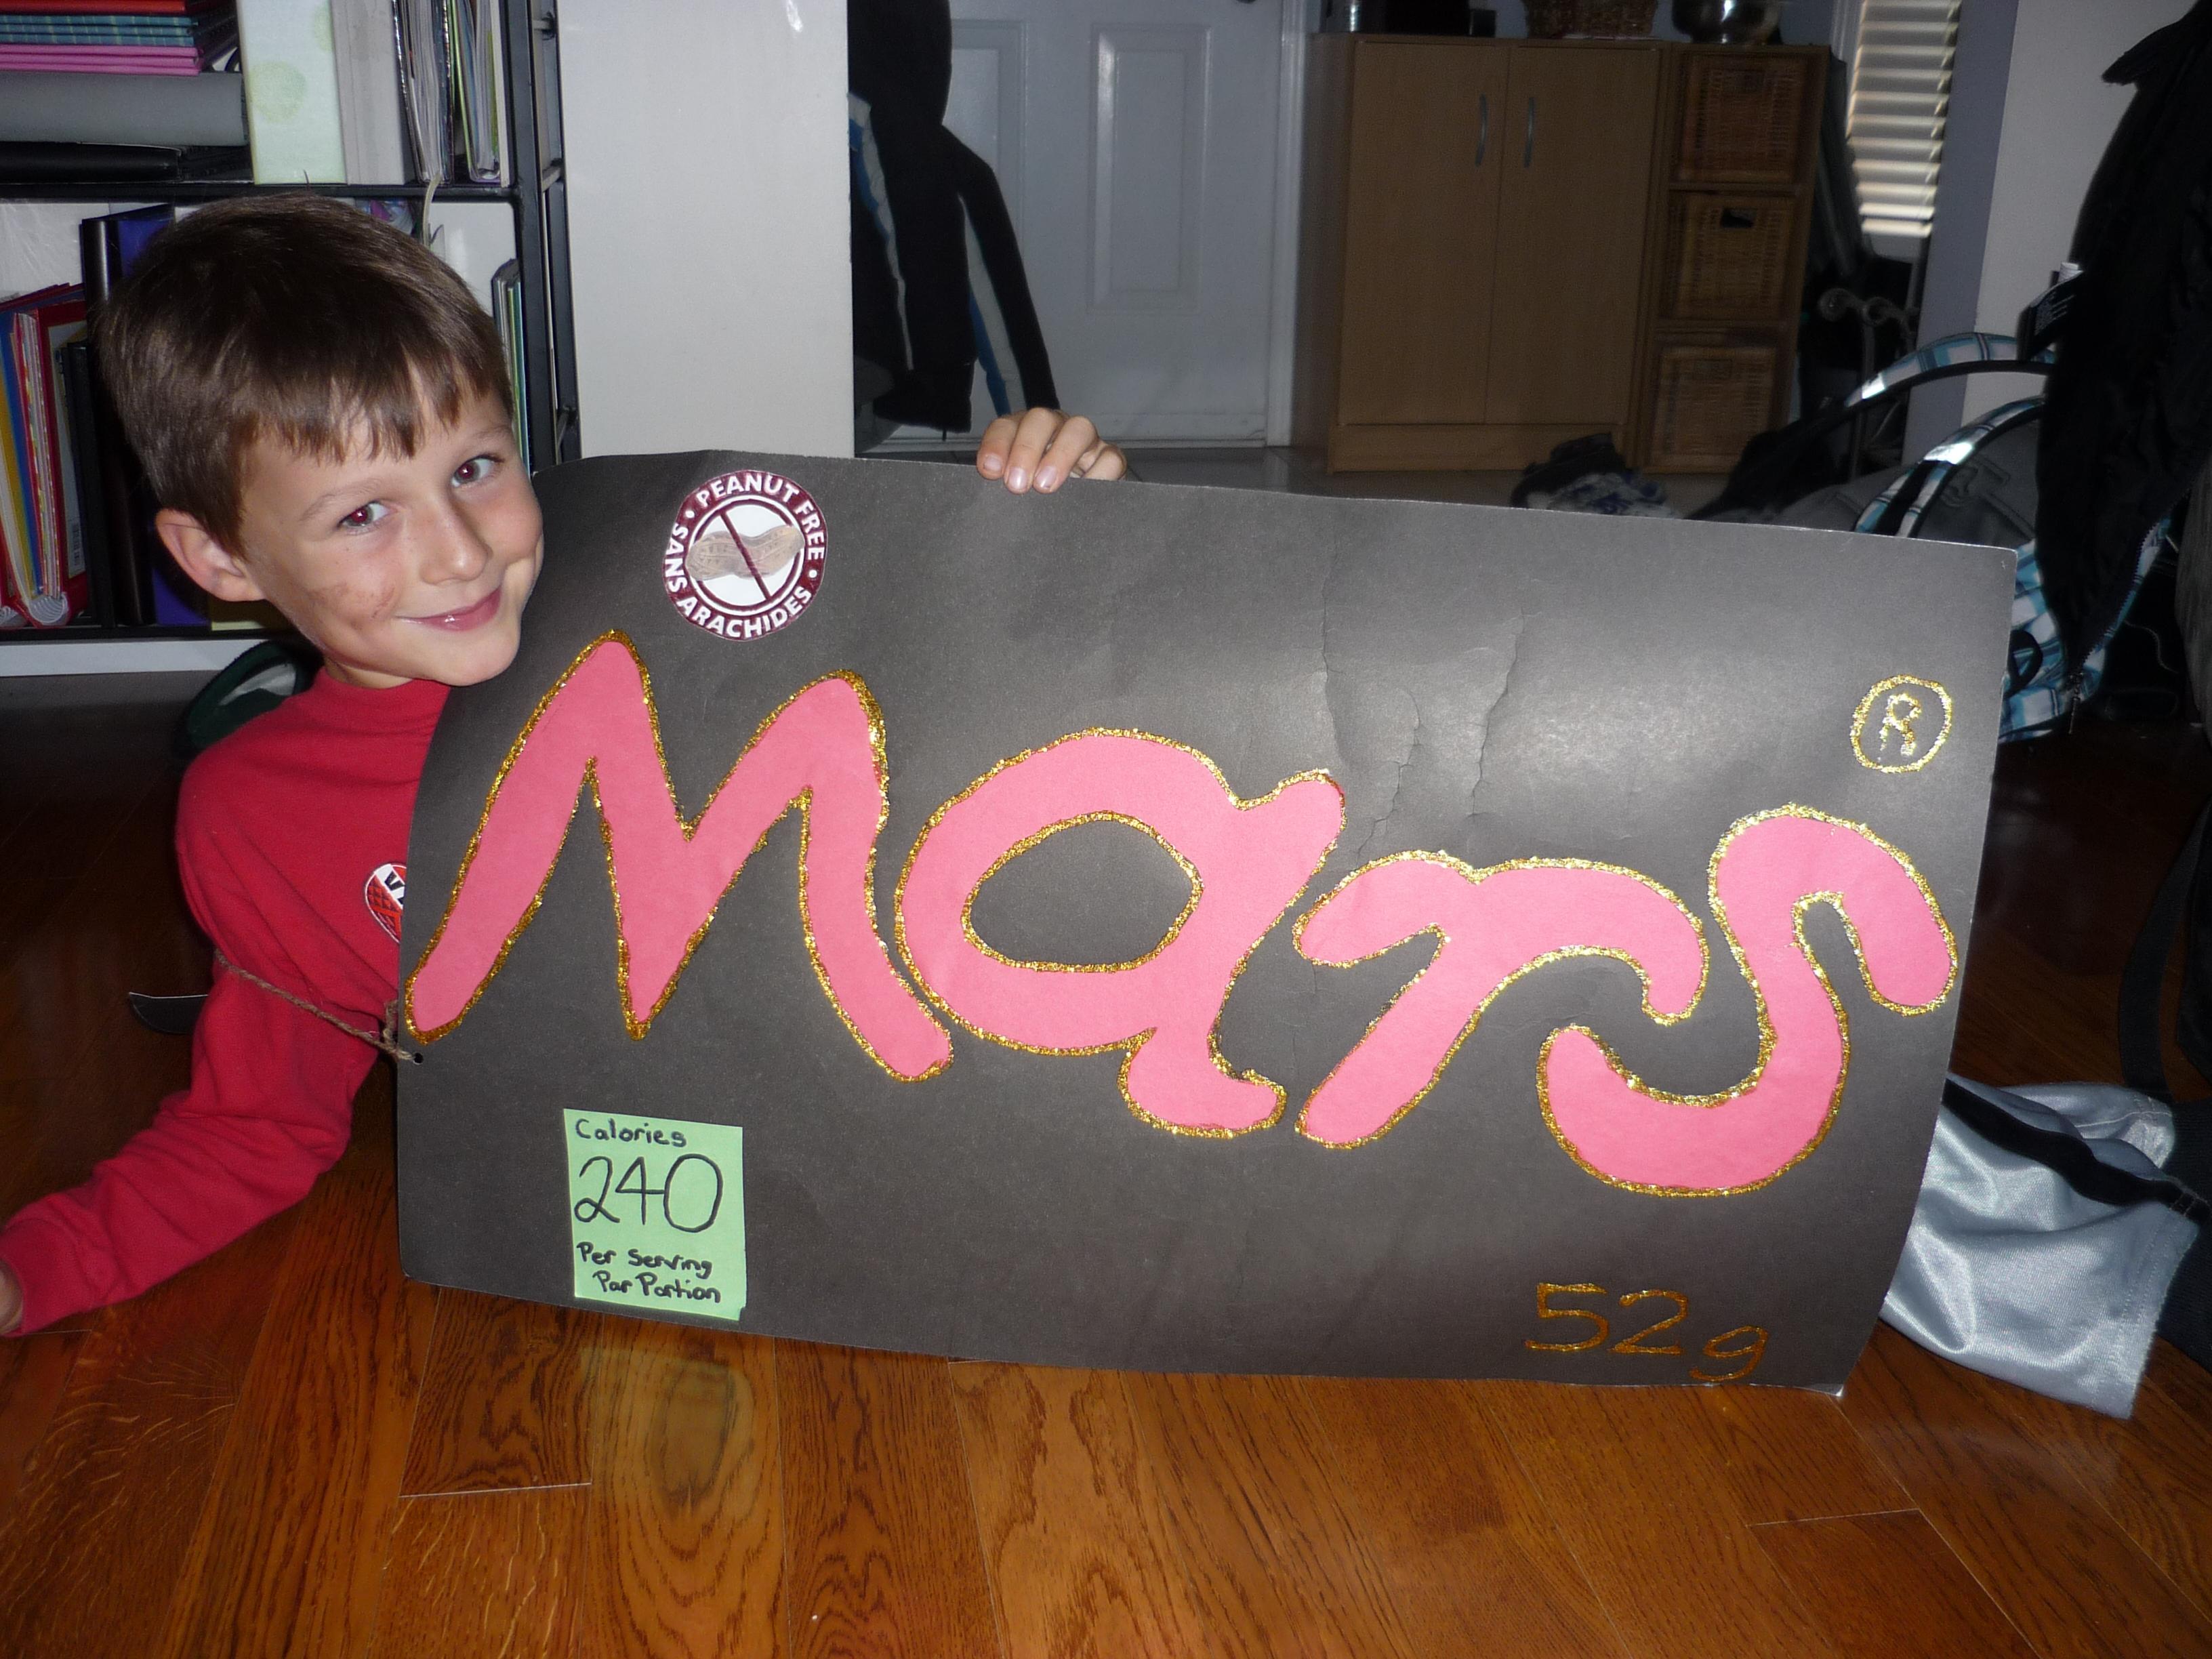 planet mars costume - photo #17